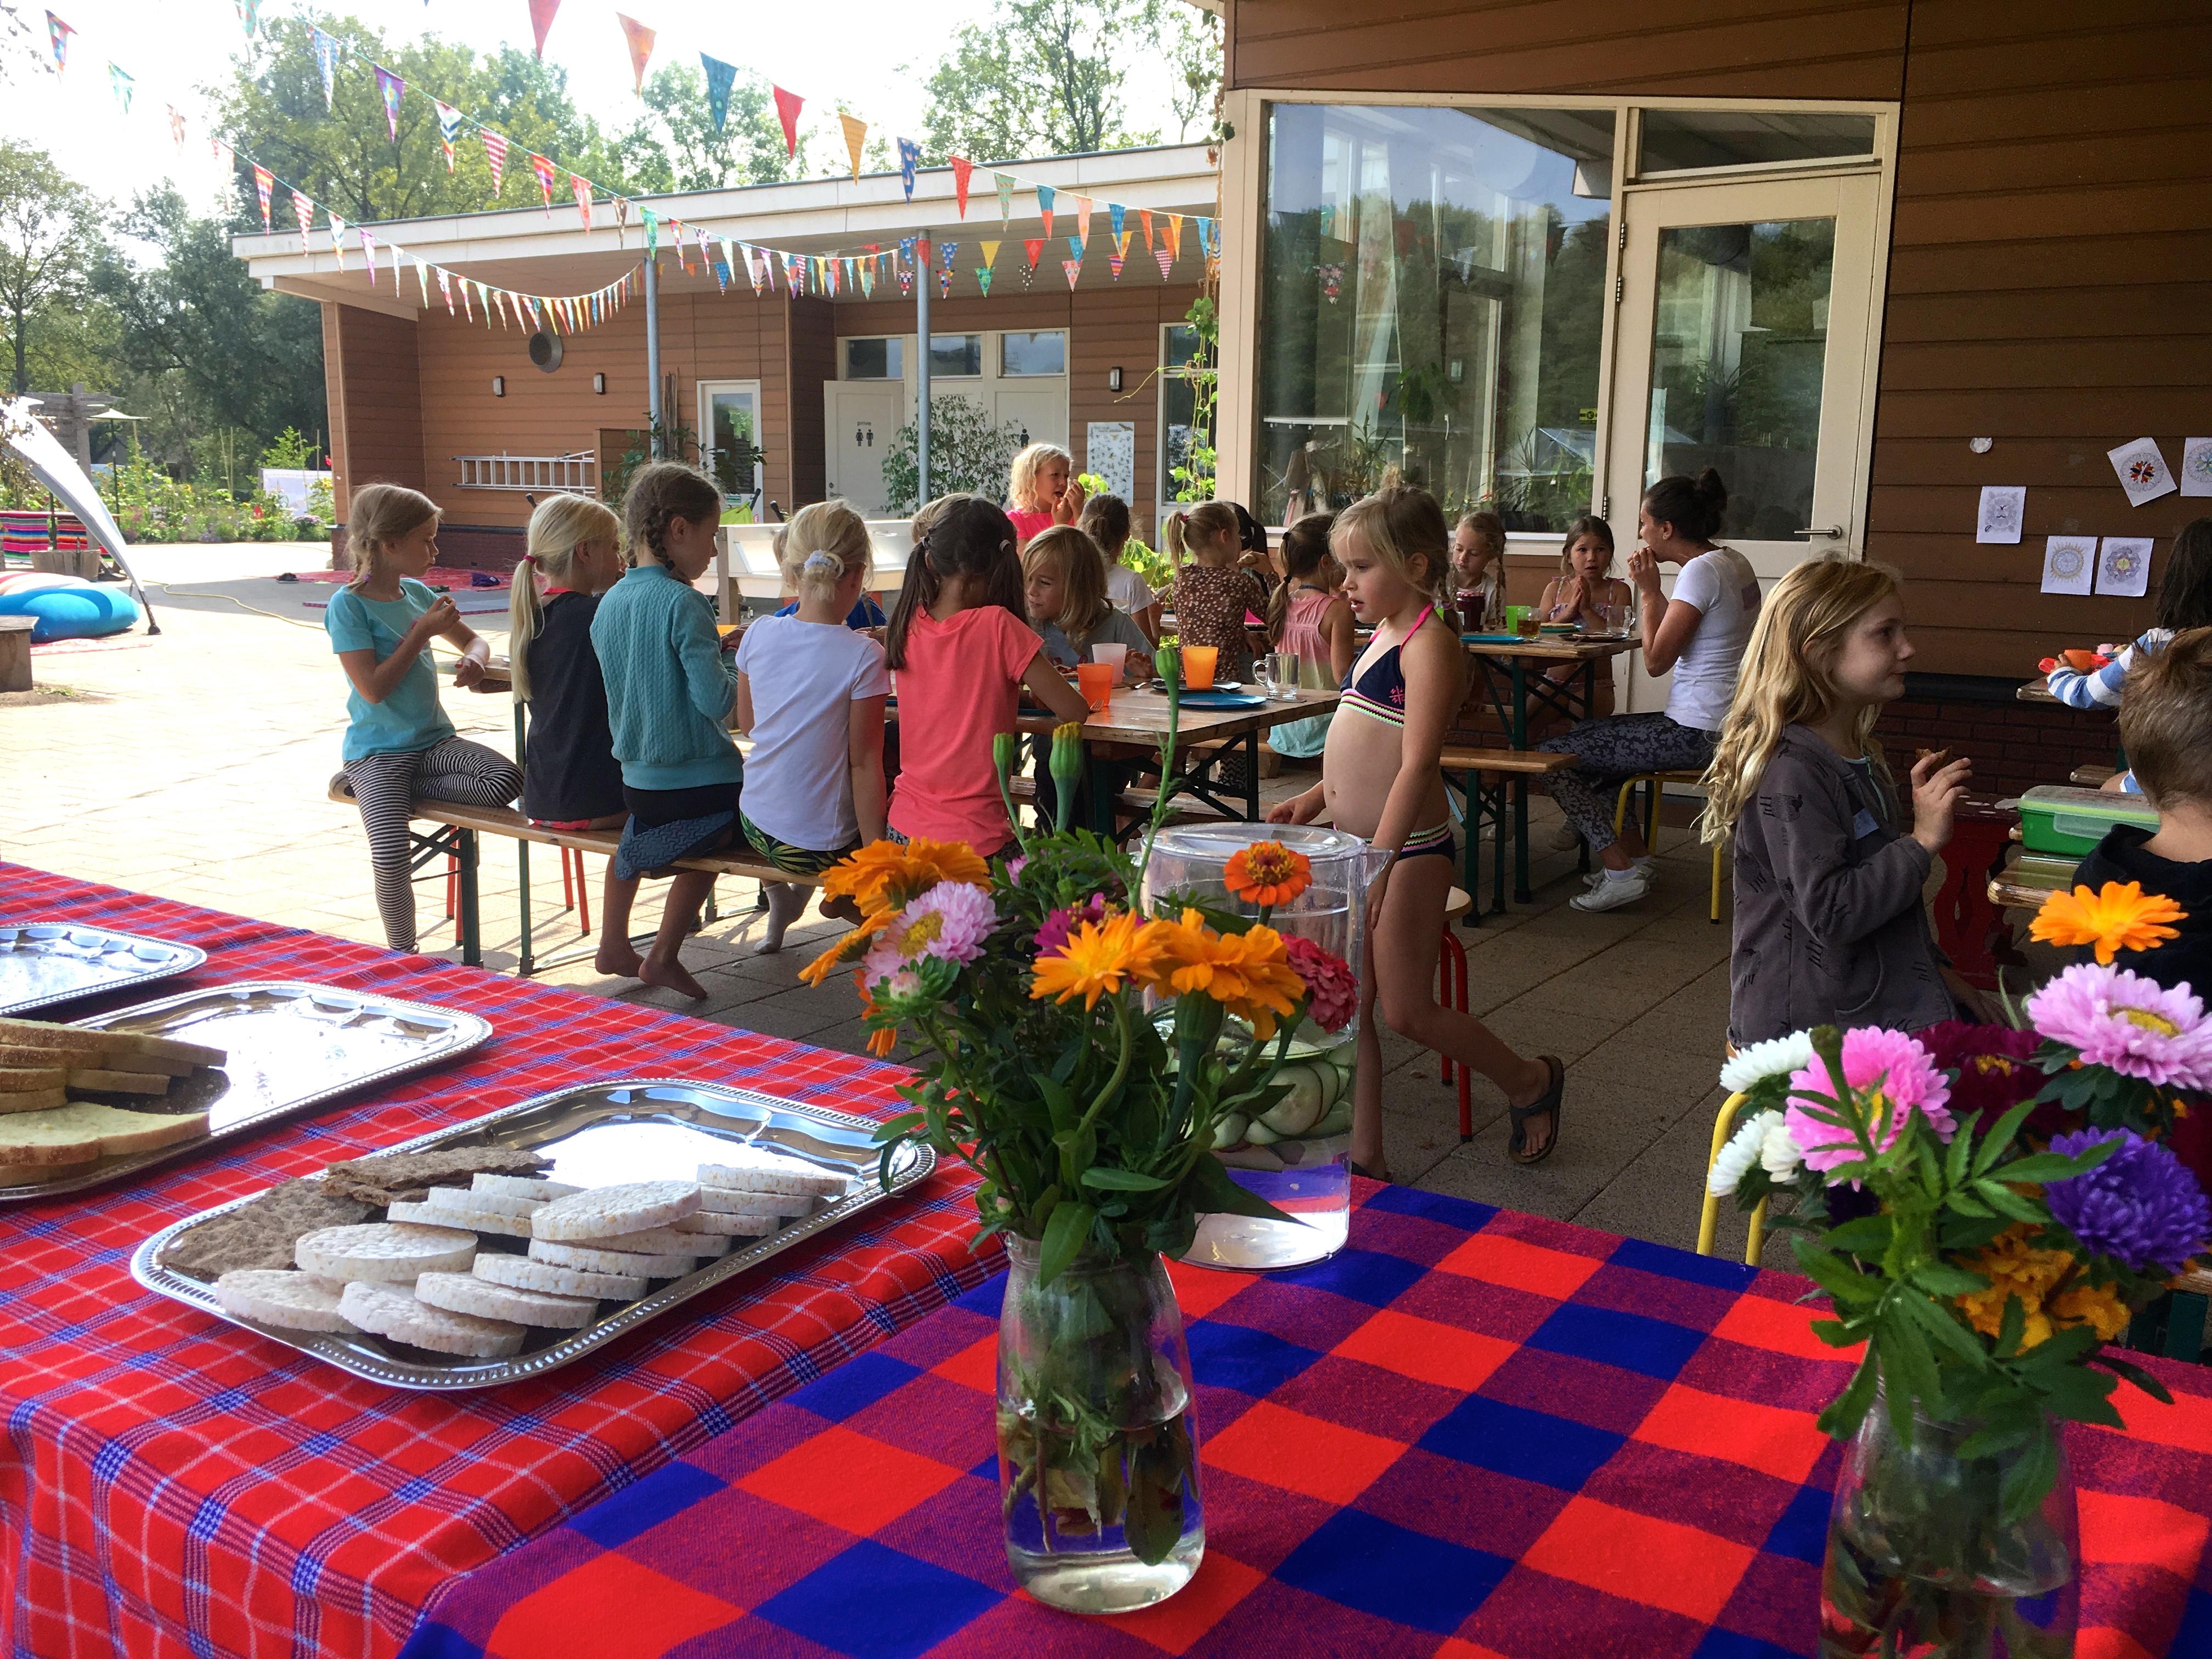 de Kinderyogatuin yogakamp zomerkamp - food for the belly & mind - kinderyoga mindfulness meditatie natuur buitenyoga aemstel schooltuin amsterdam amstelveen.jpg